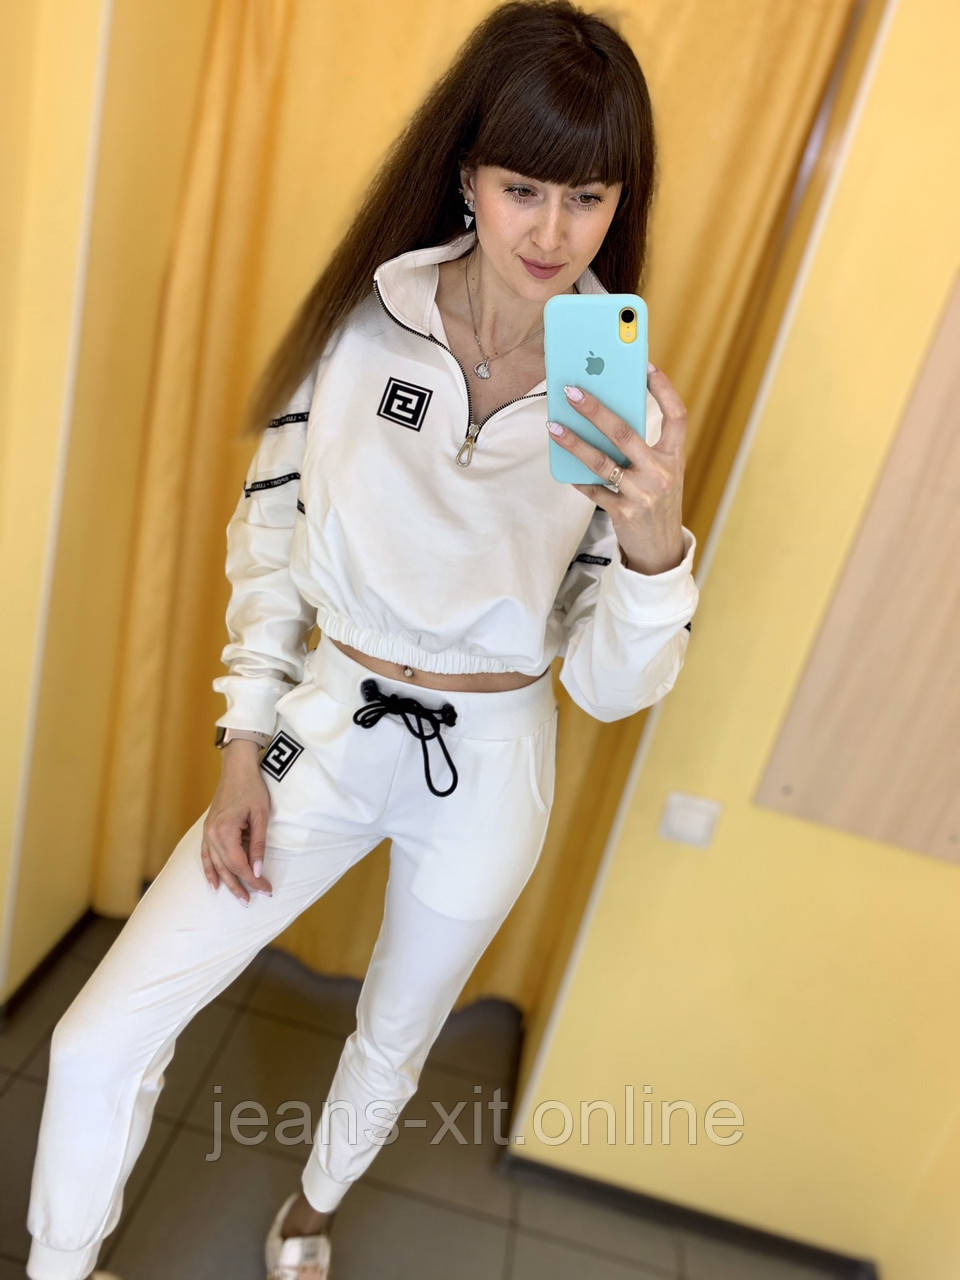 Fashion костюм женский L(р) белый 8623 Speedway Турция Весна-C